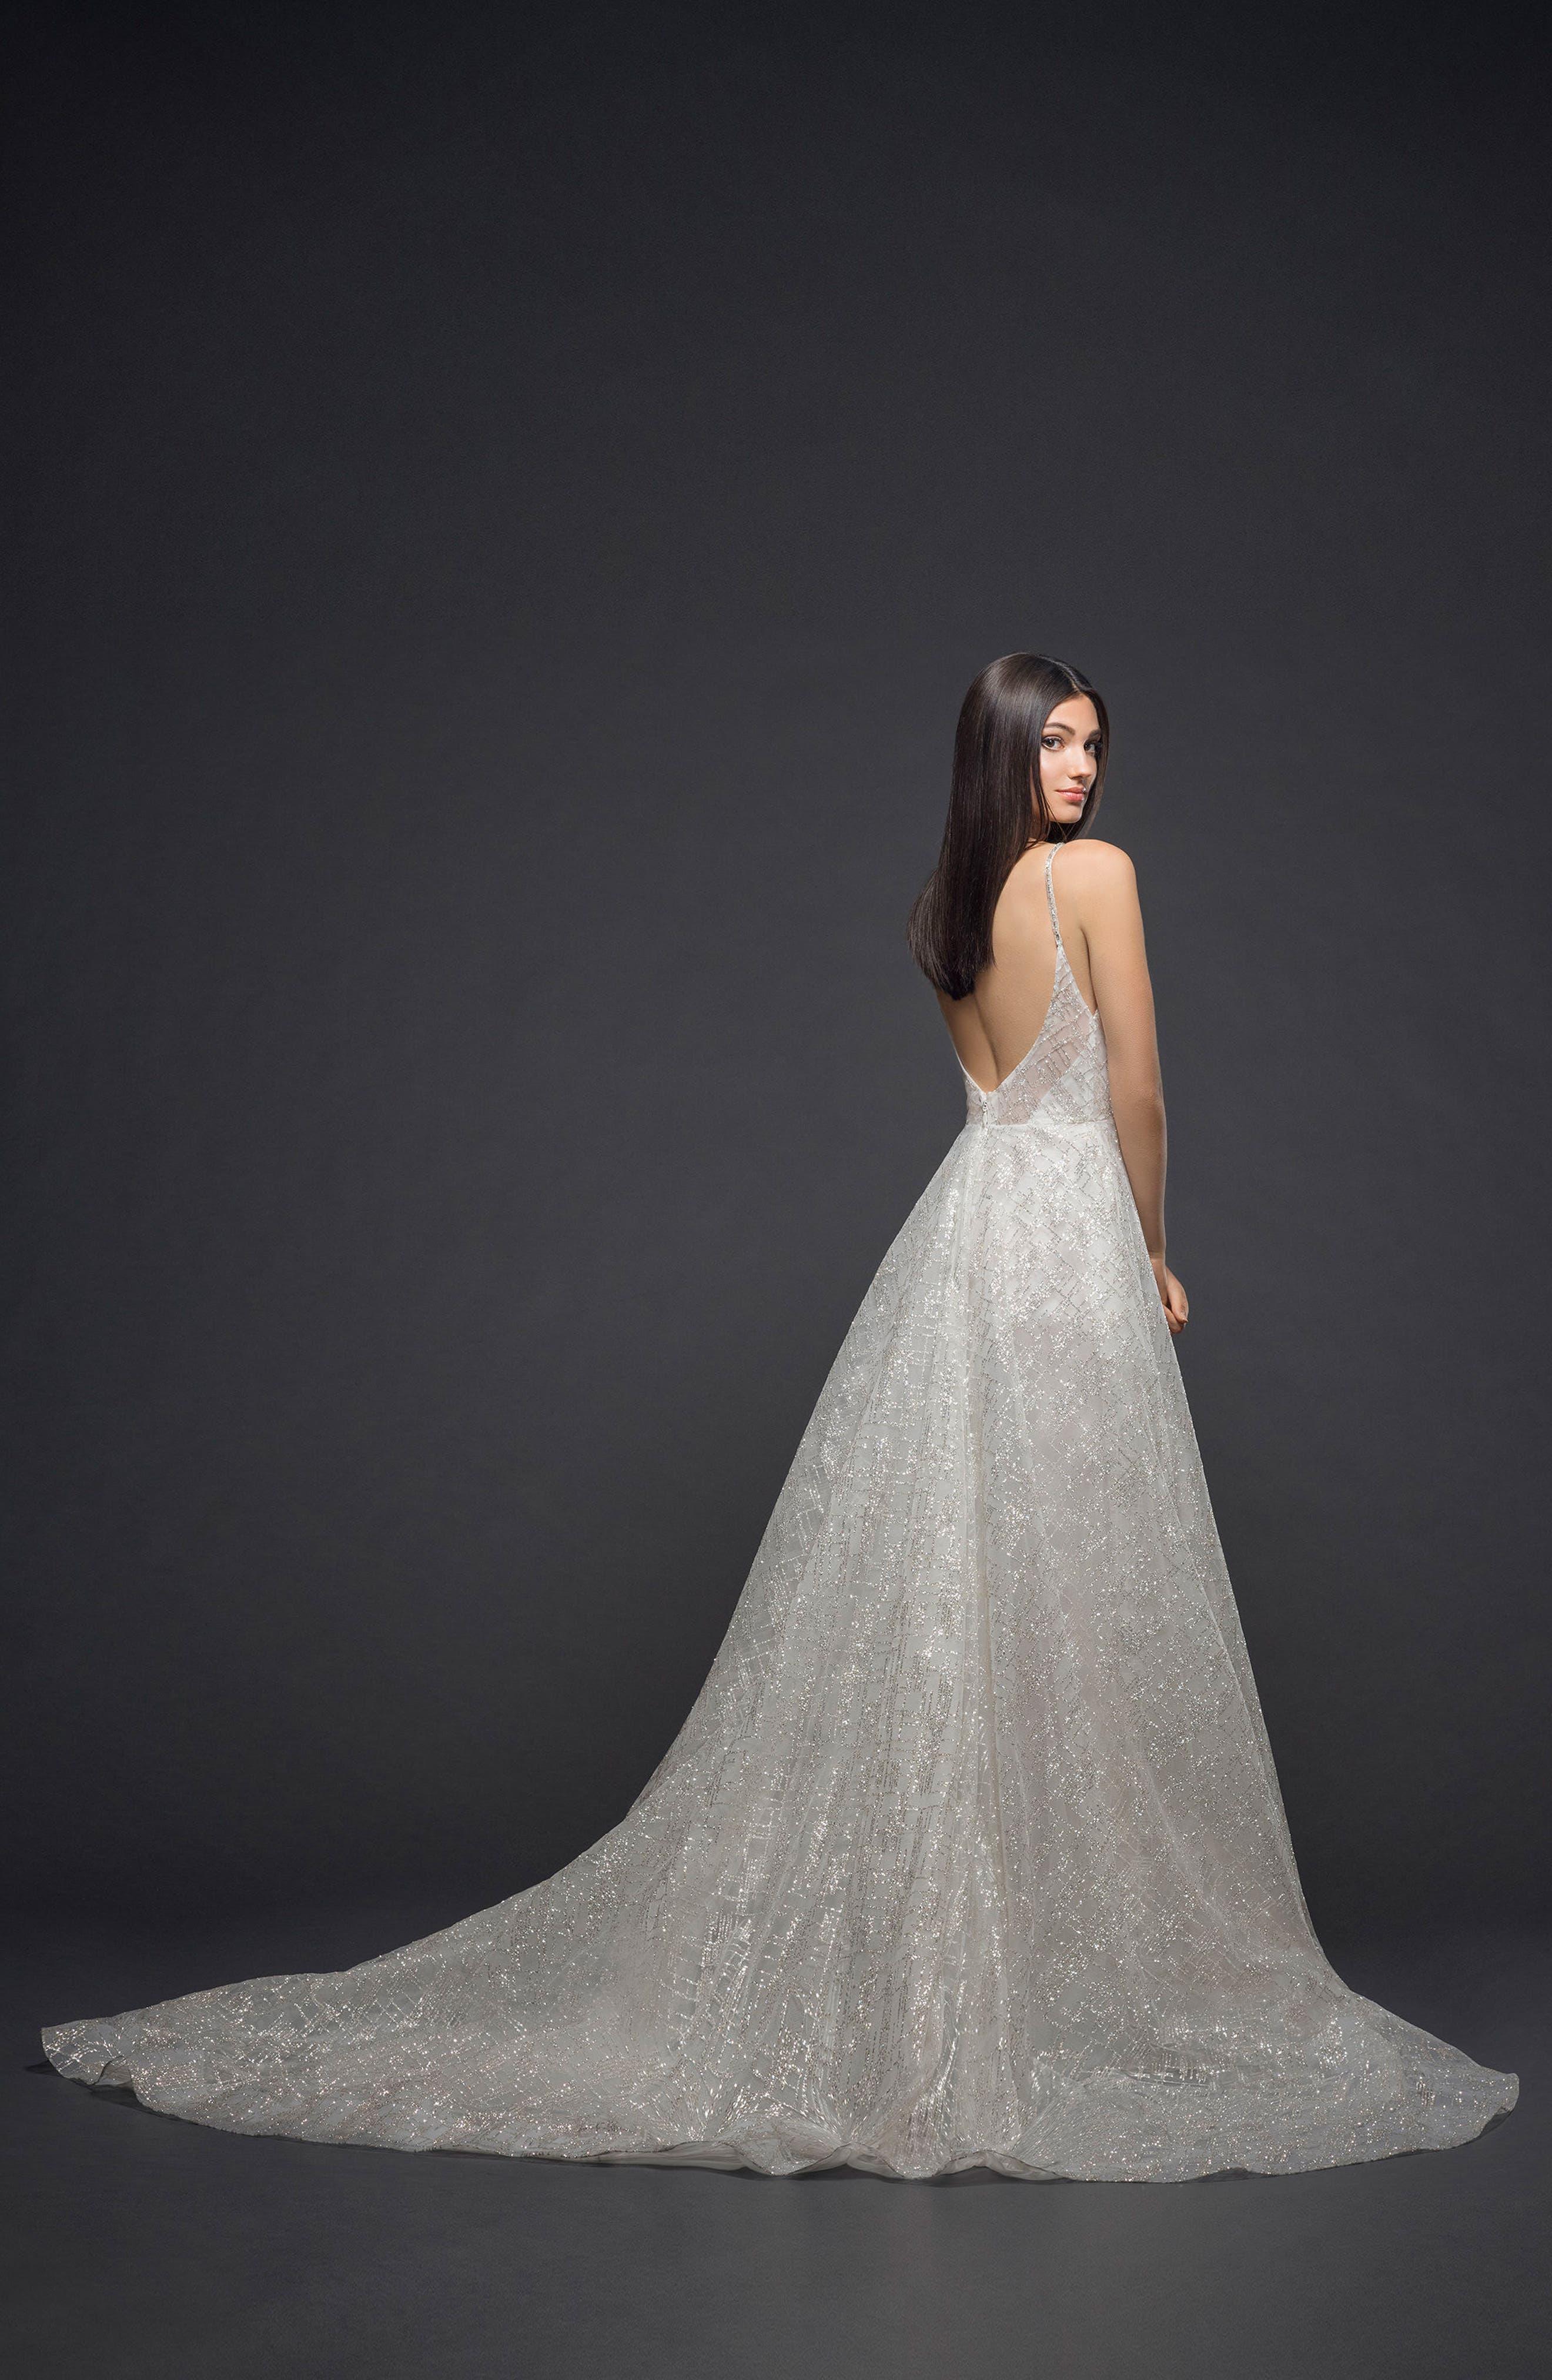 Sparkle Plaid Tulle A-Line Gown,                             Alternate thumbnail 2, color,                             IVORY